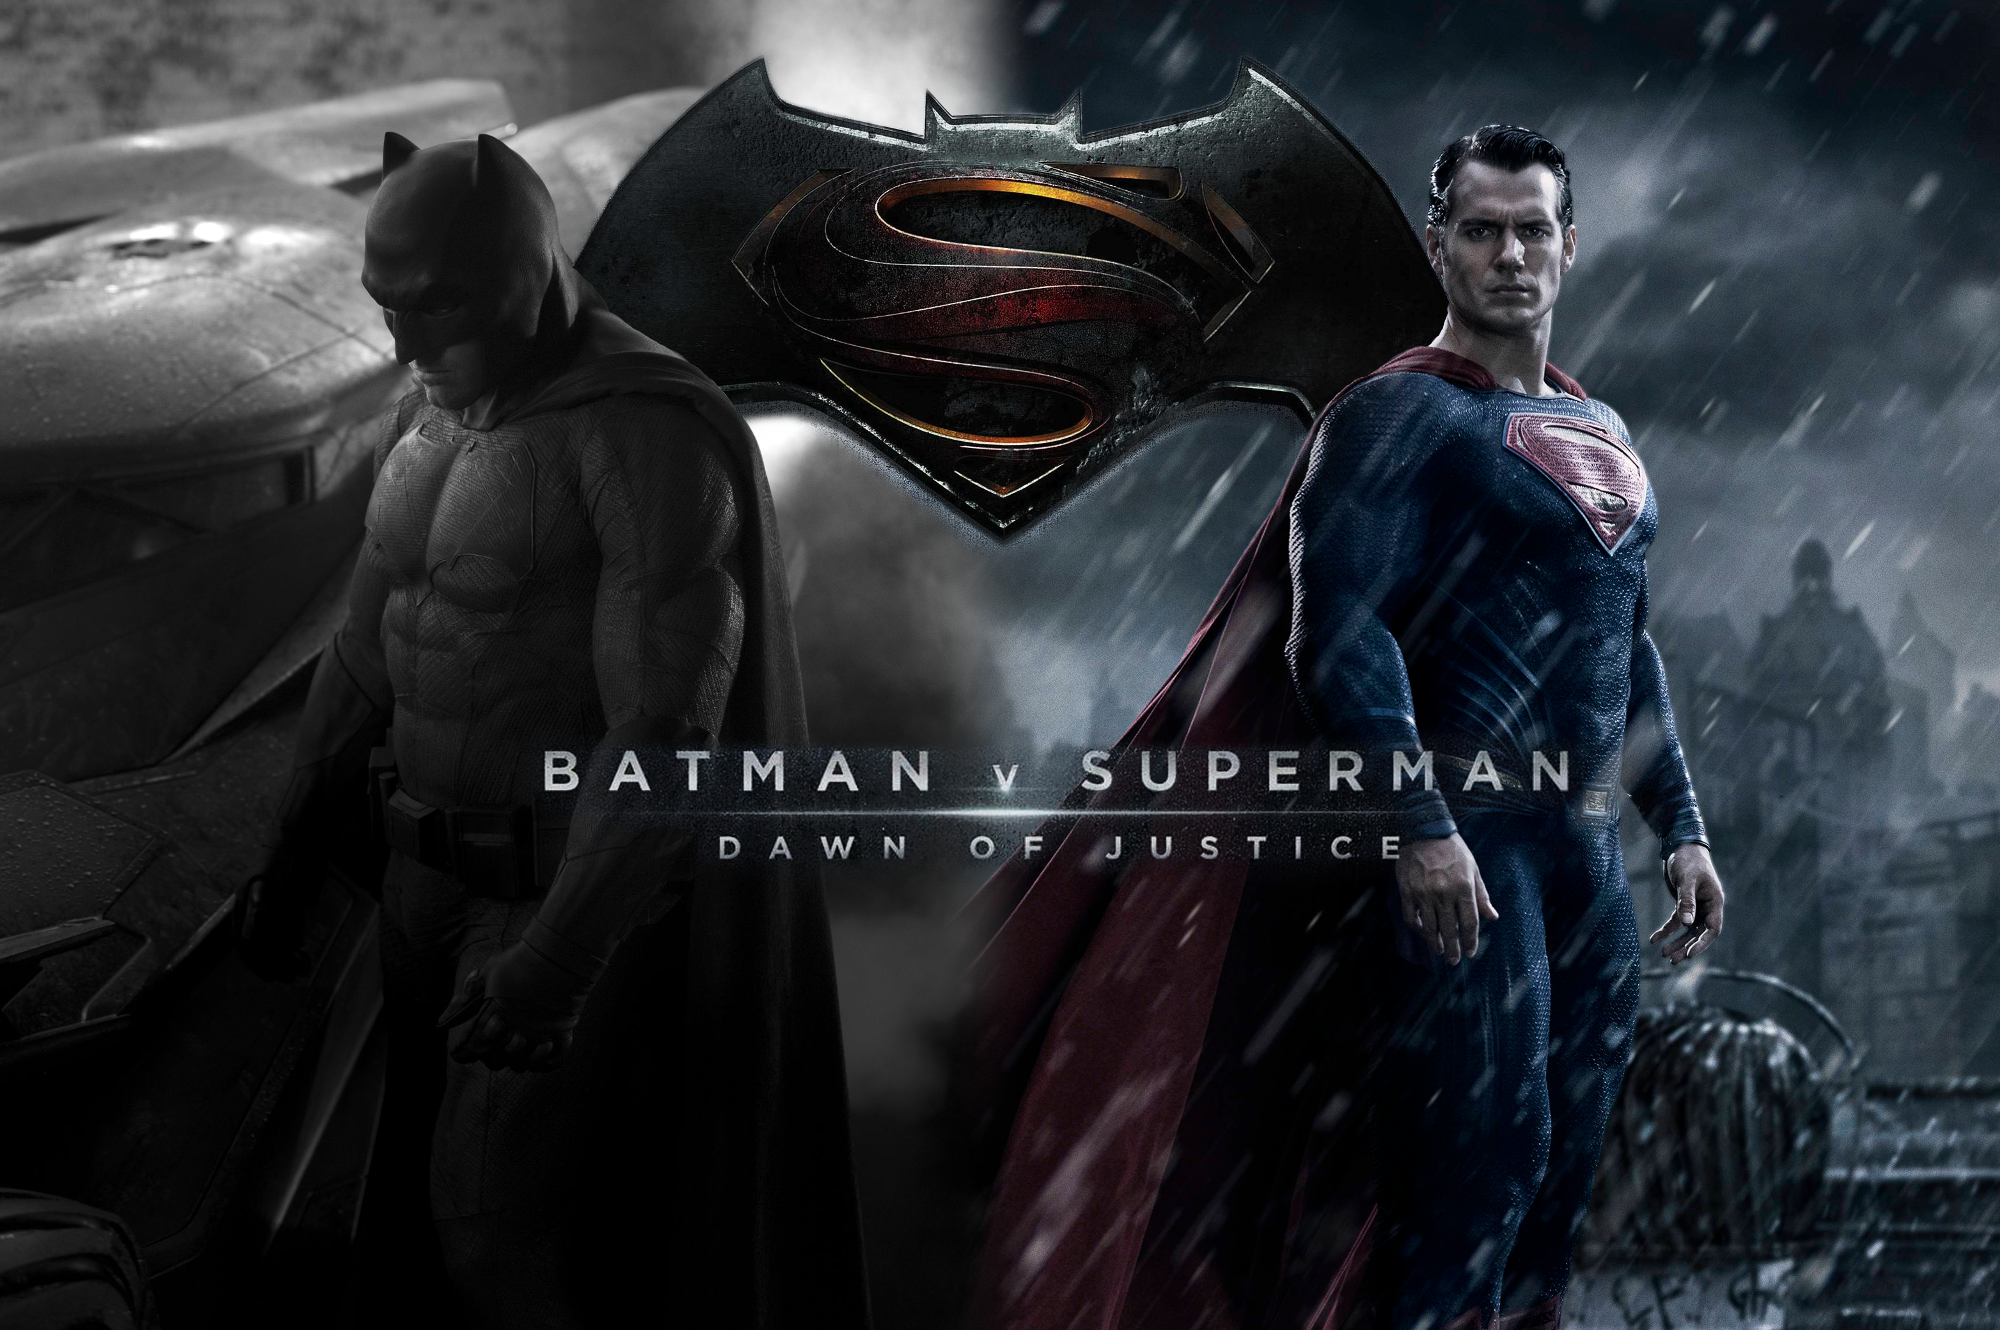 Batman V Superman Dawn Of Justice Wallpaper Wide Awesome 4fbi8j9q 2000x1330